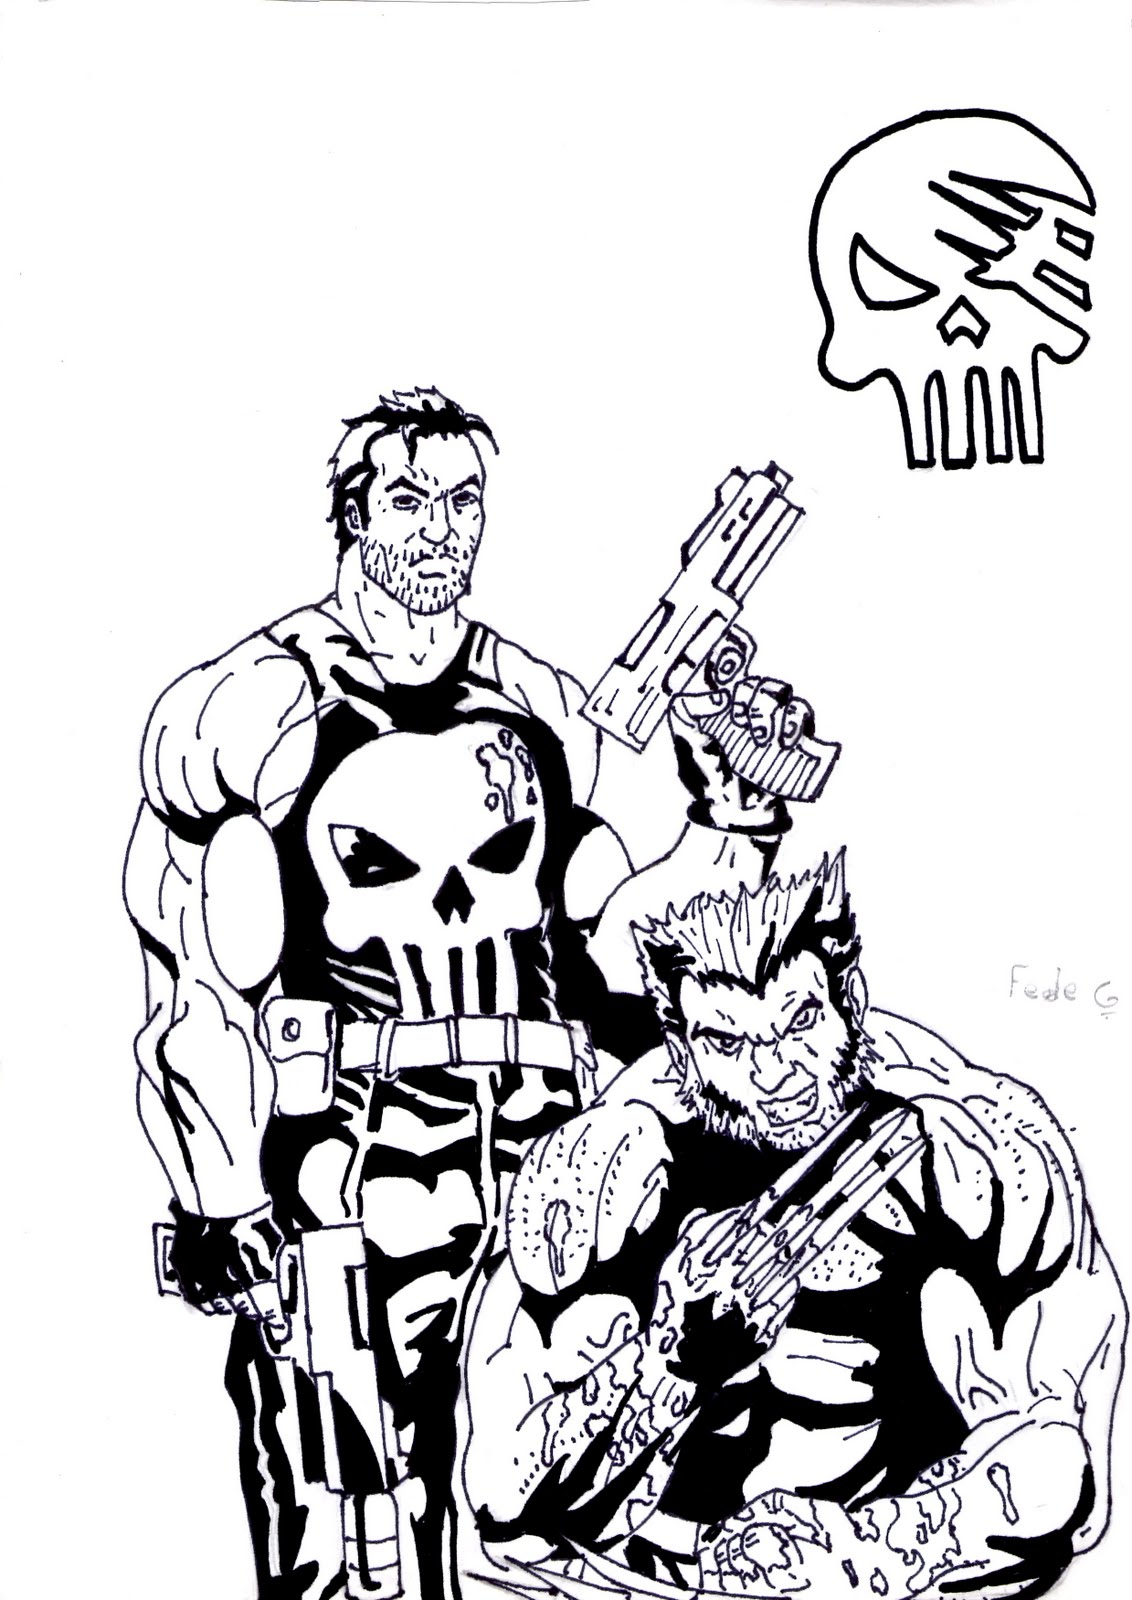 dibujando el kaos: Wolverine/Punisher